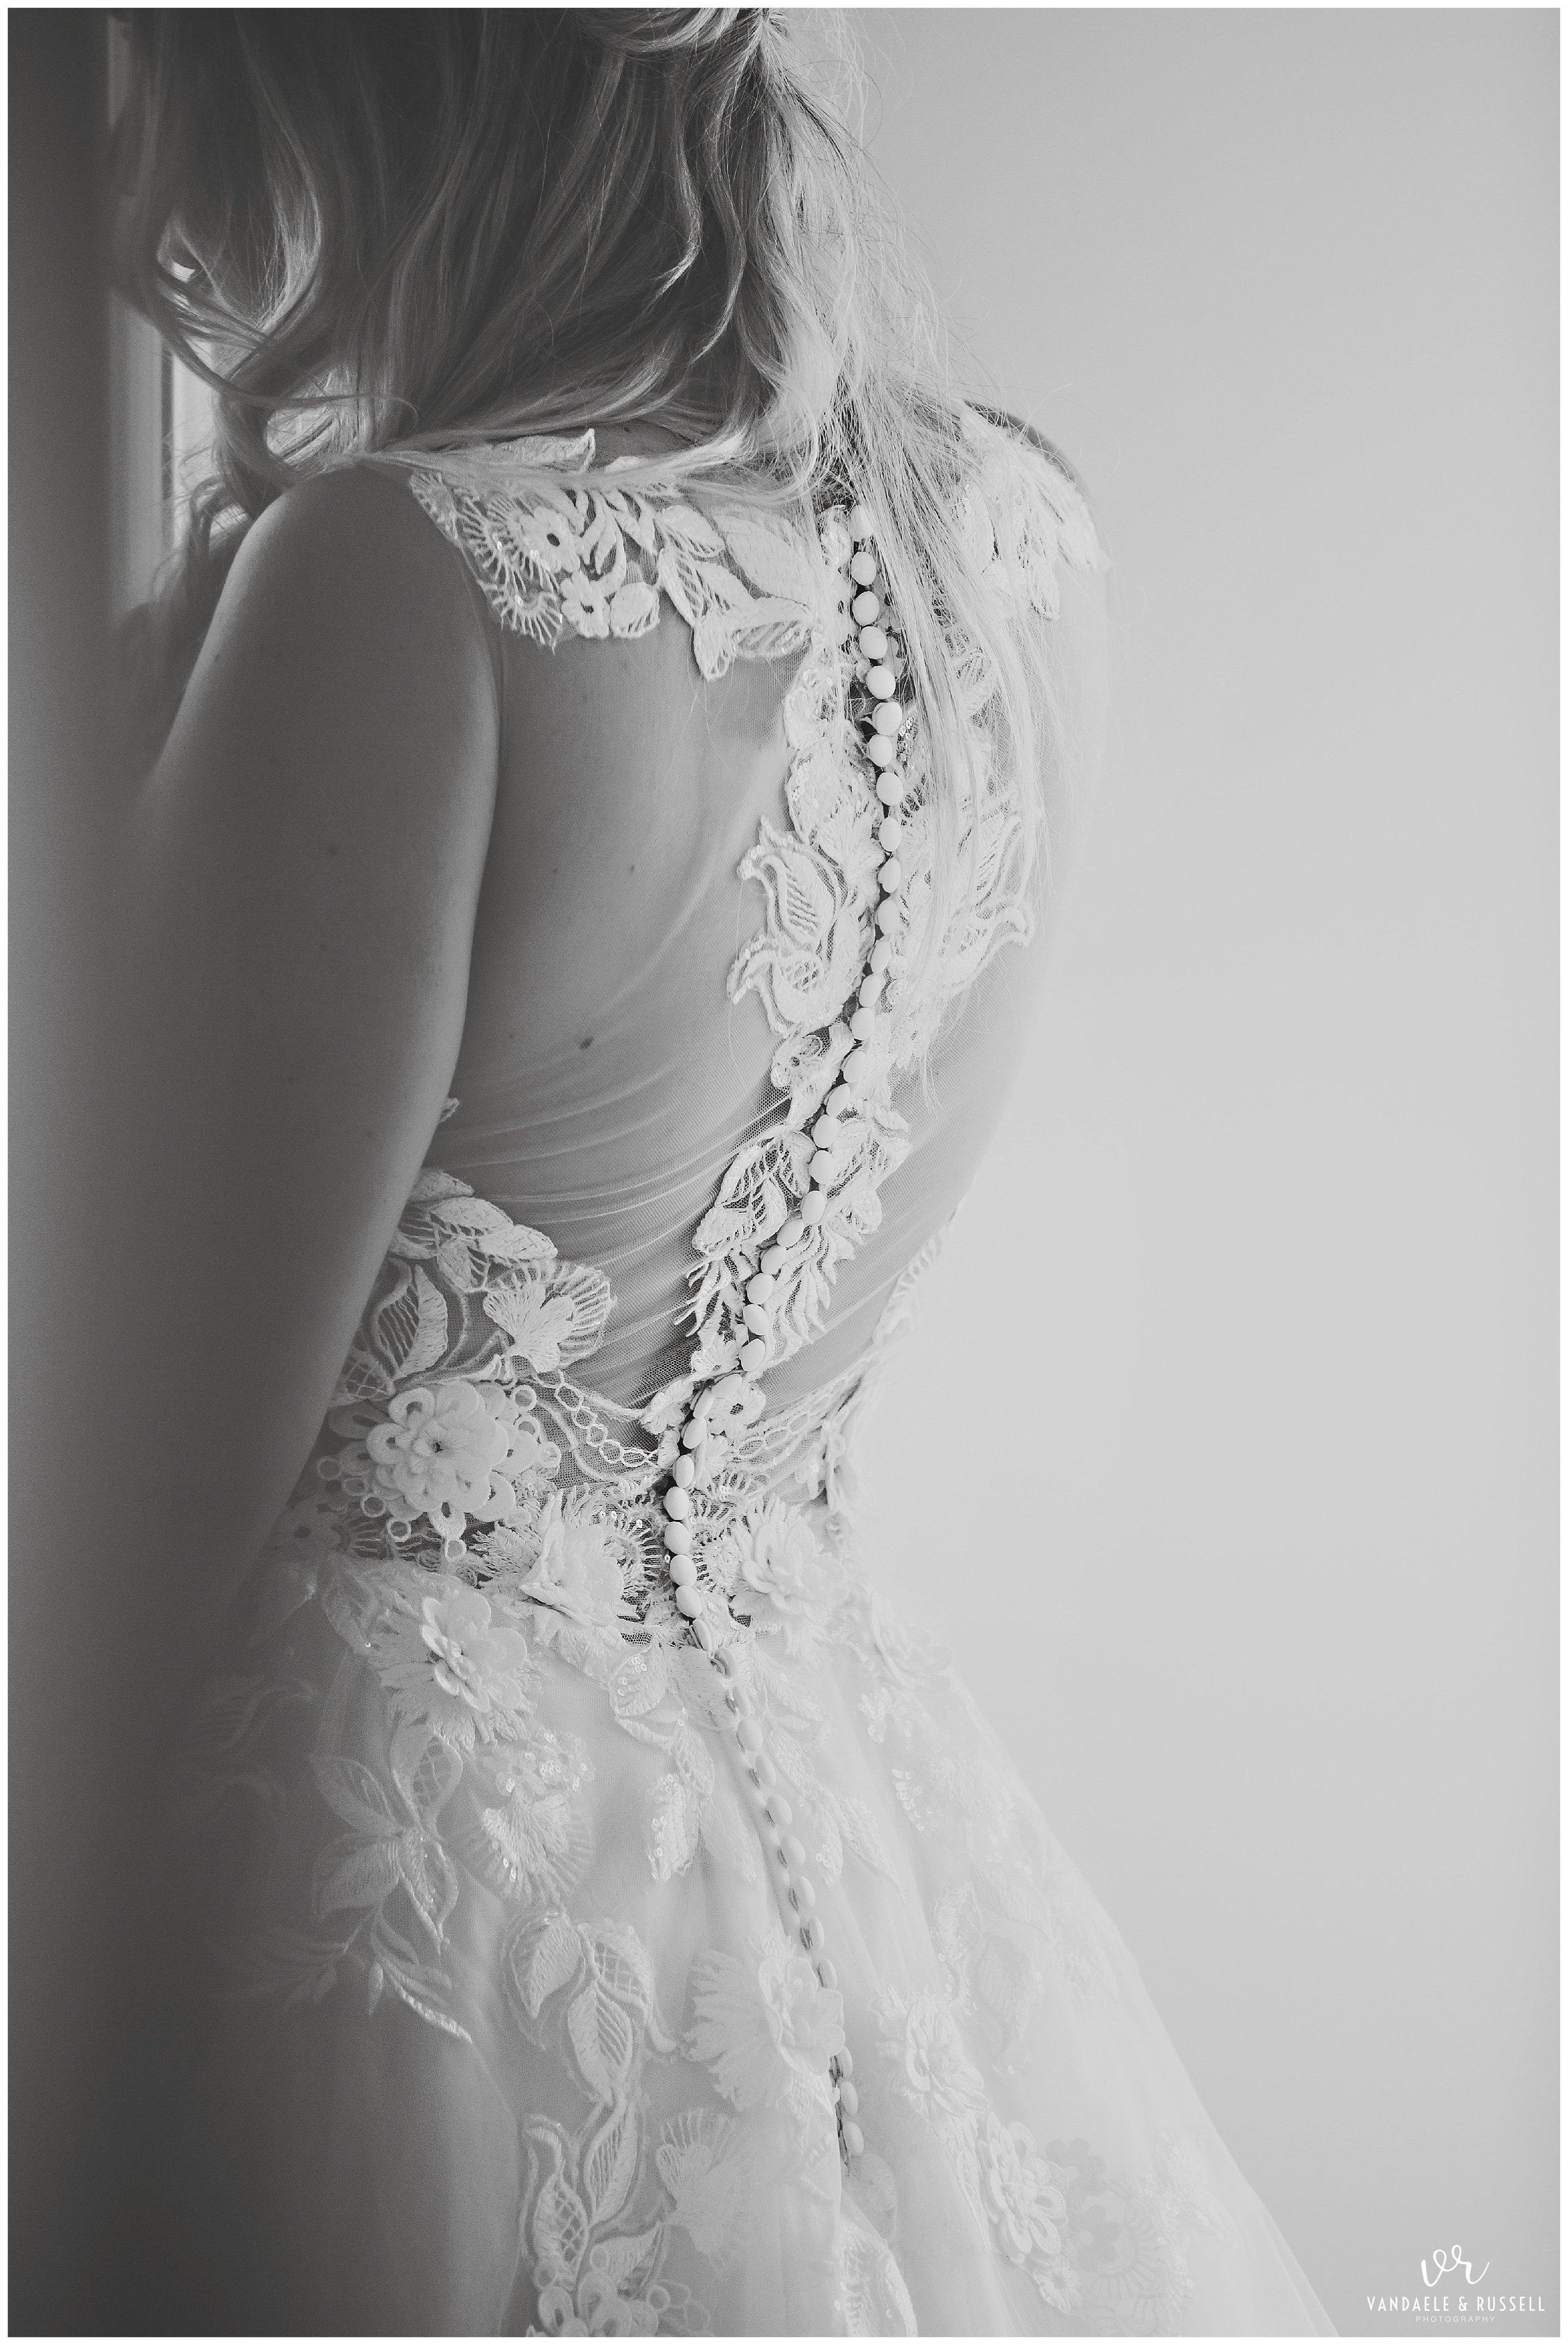 VanDaele-Russell-Wedding-Photography-London-Toronto-Ontario_0109.jpg